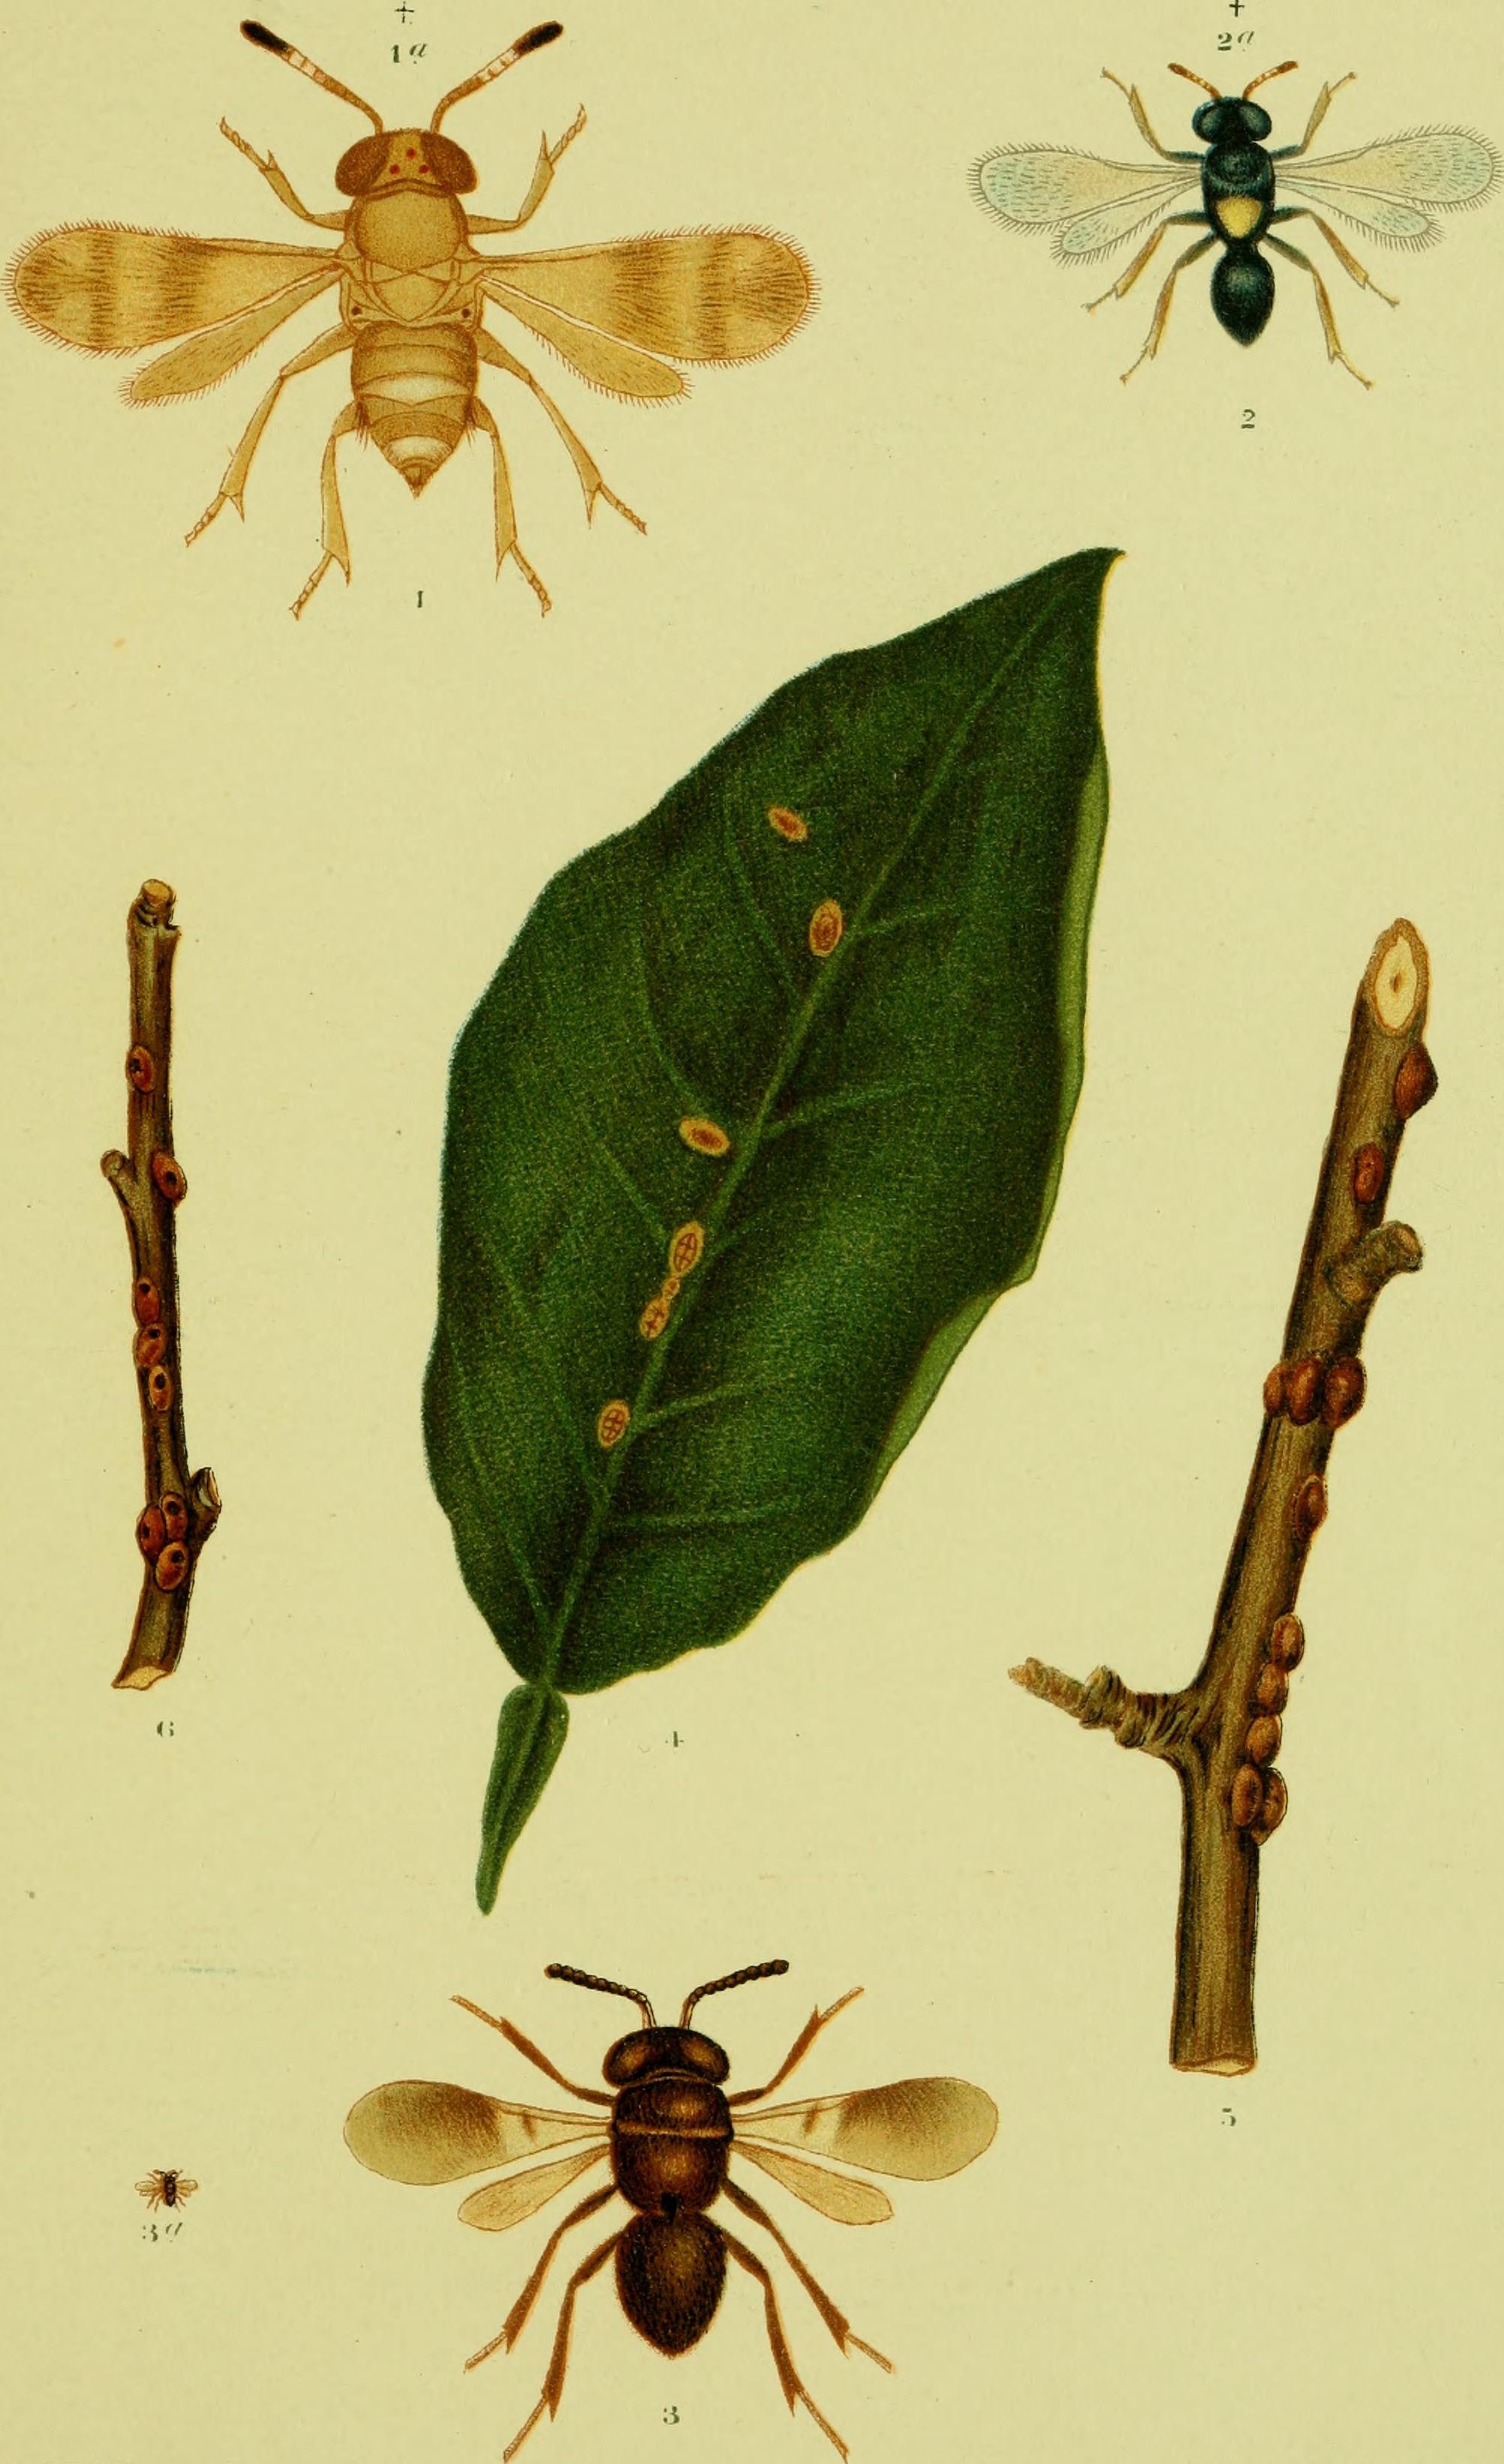 Image de Encyrtidae